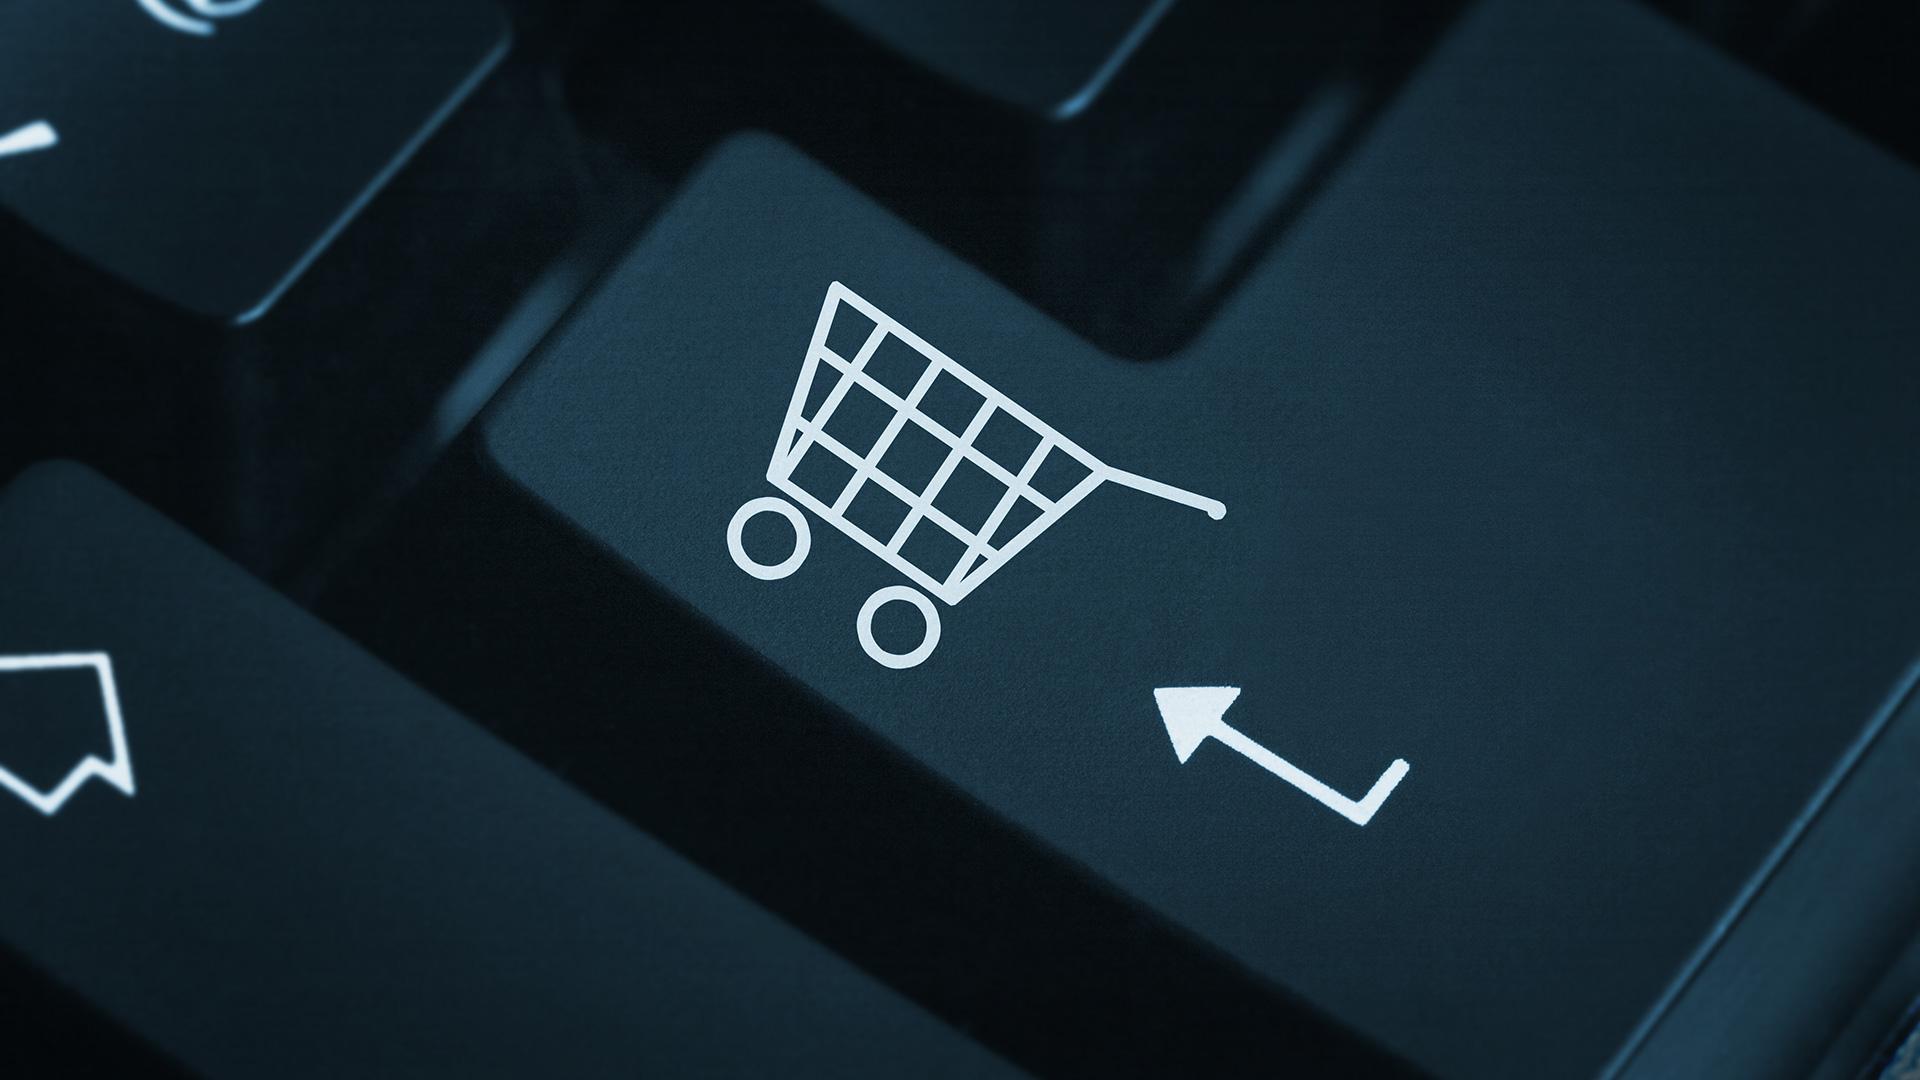 ecommerce-shopping-cart-keyboard-ss-1920